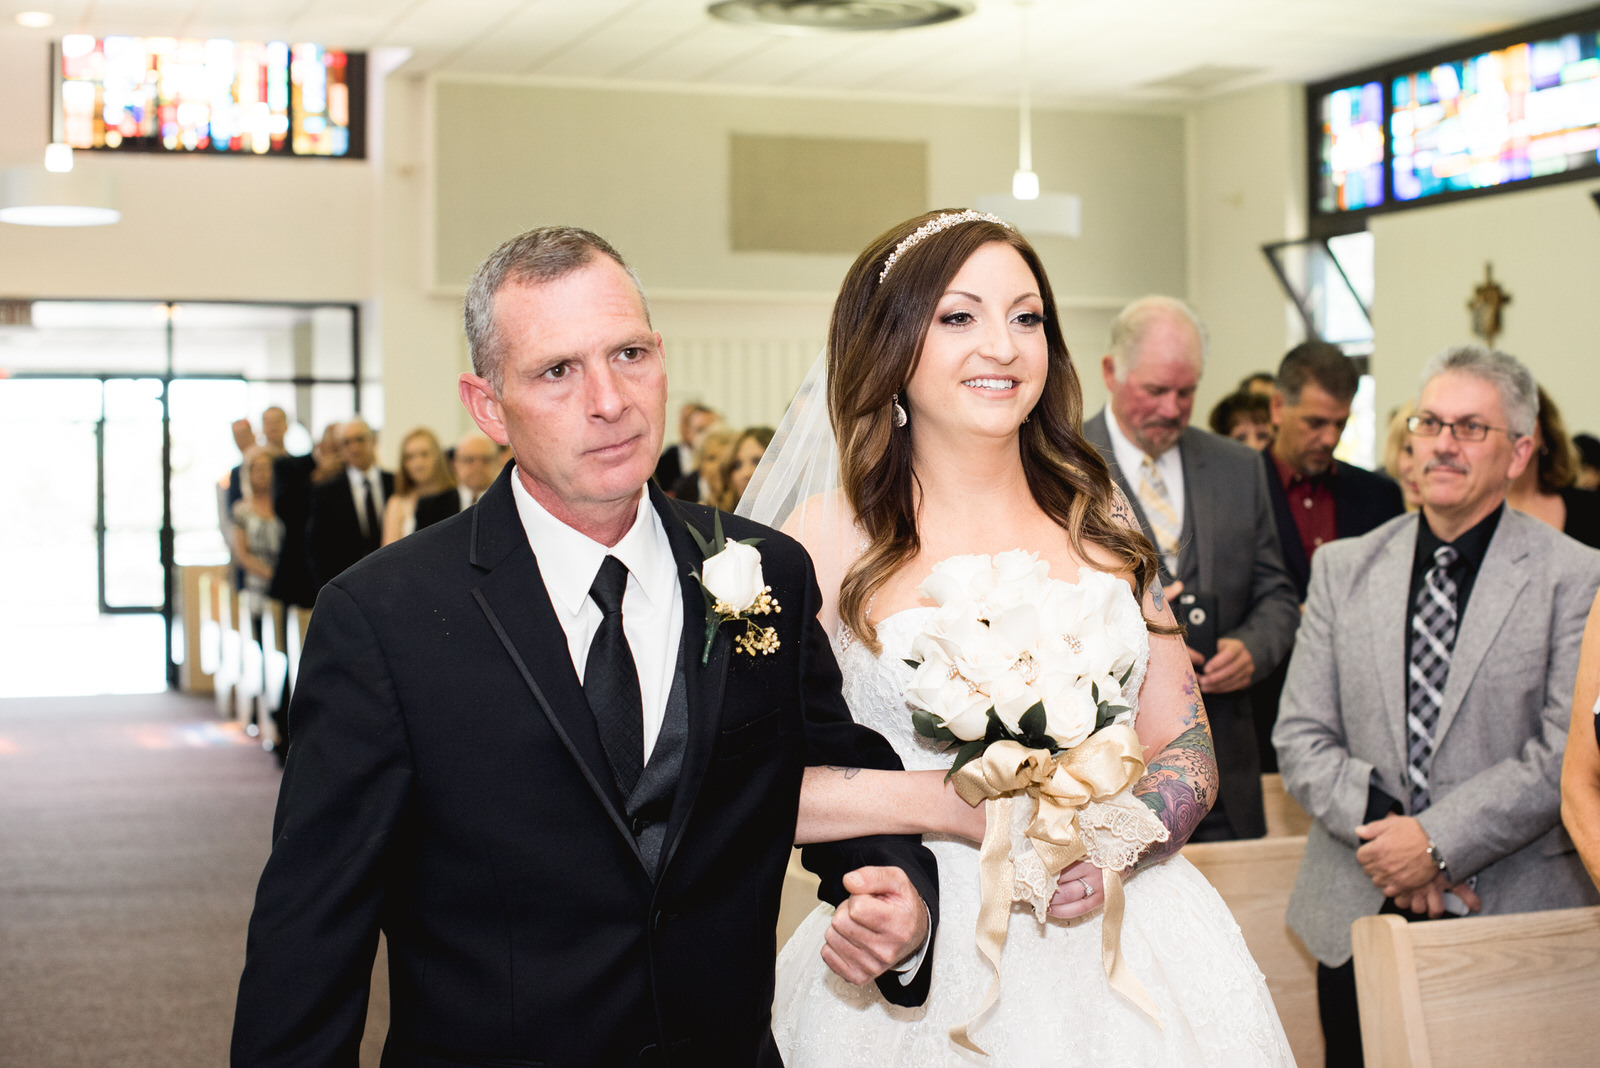 Laube_Banquet_Hall__Wedding_Photos_006.jpg